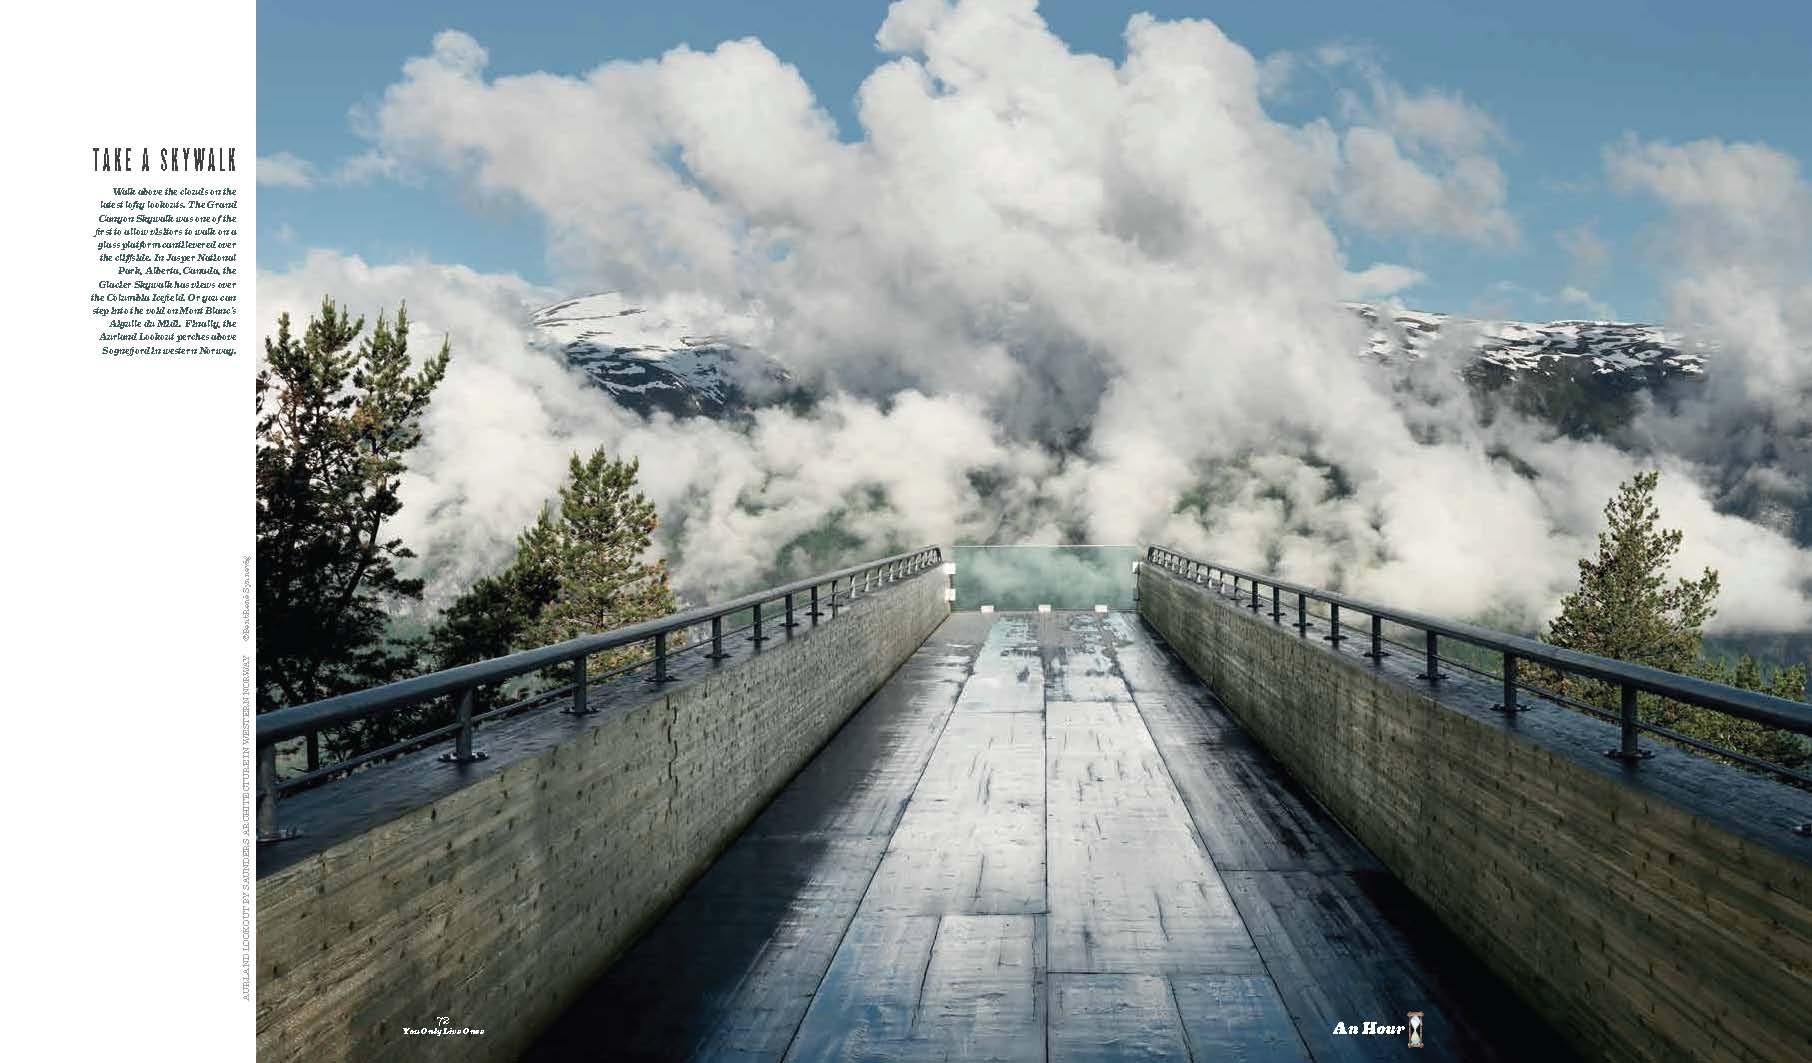 skywalk-lonely-planet-yolo